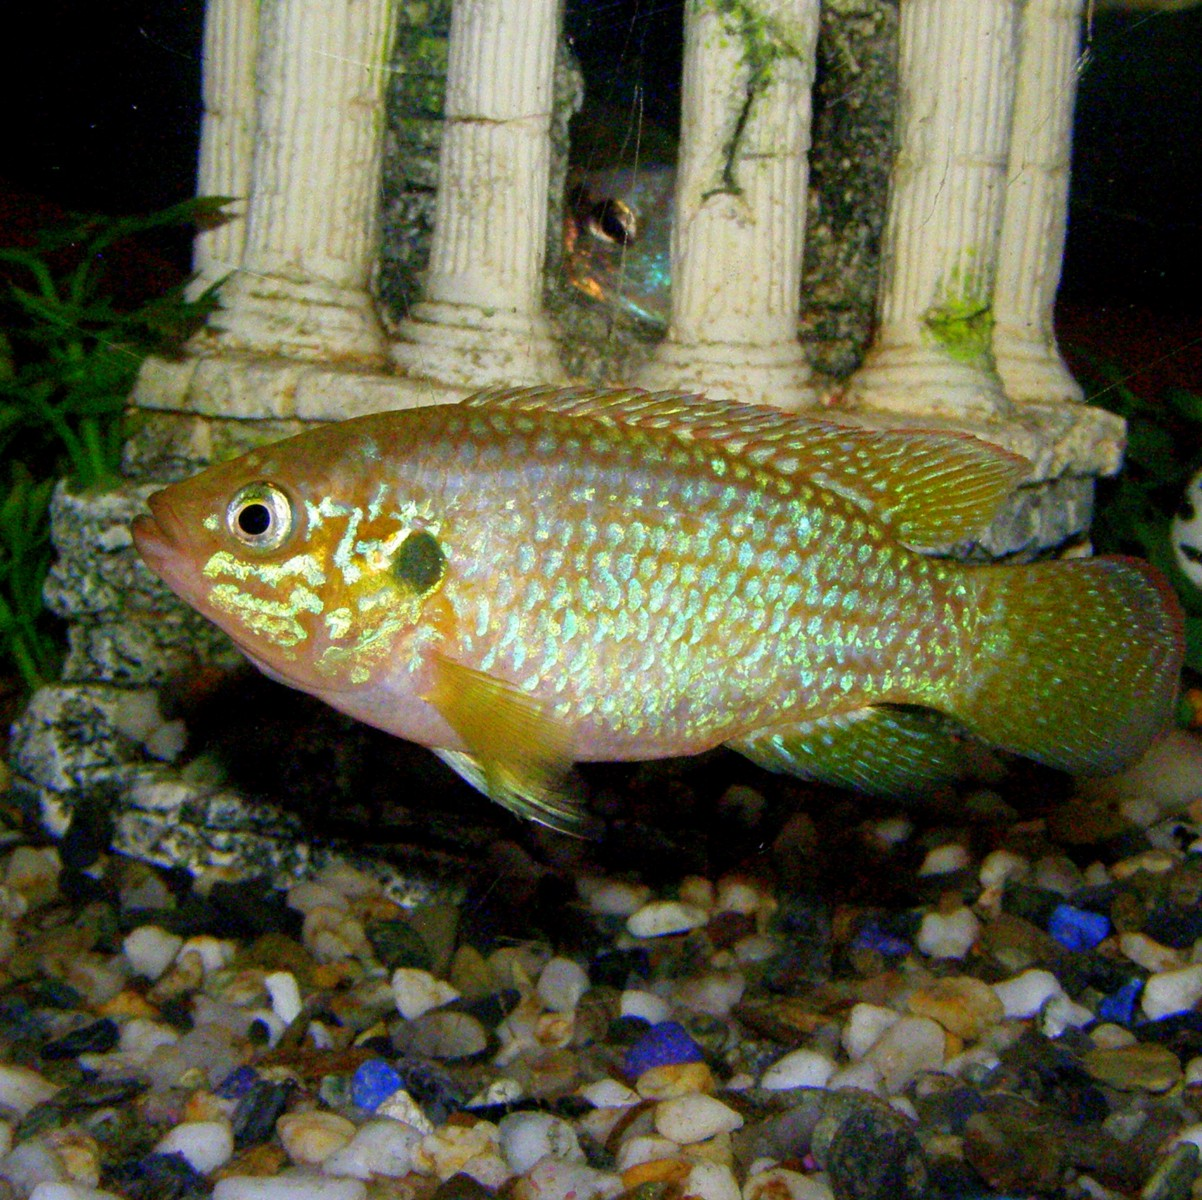 cichlids.com: Lake malawi cichlid??